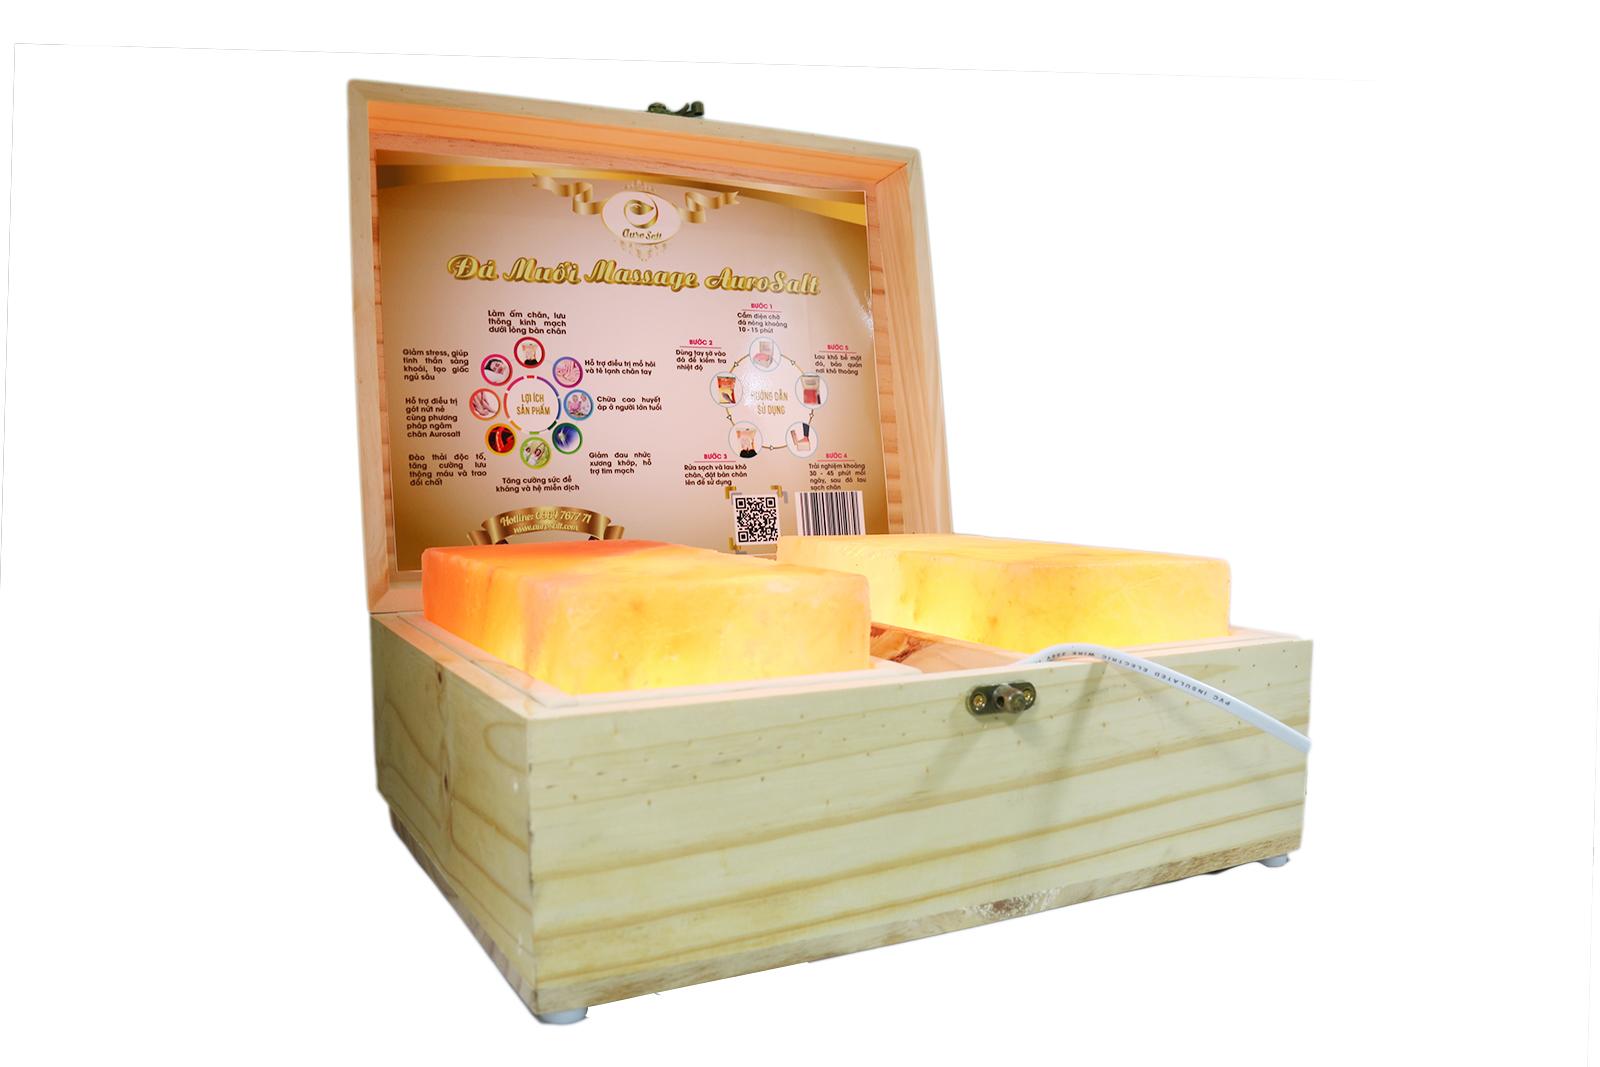 Hộp Đá Himalaya Massage Chân Aurosalt  - 2 Viên Phẳng